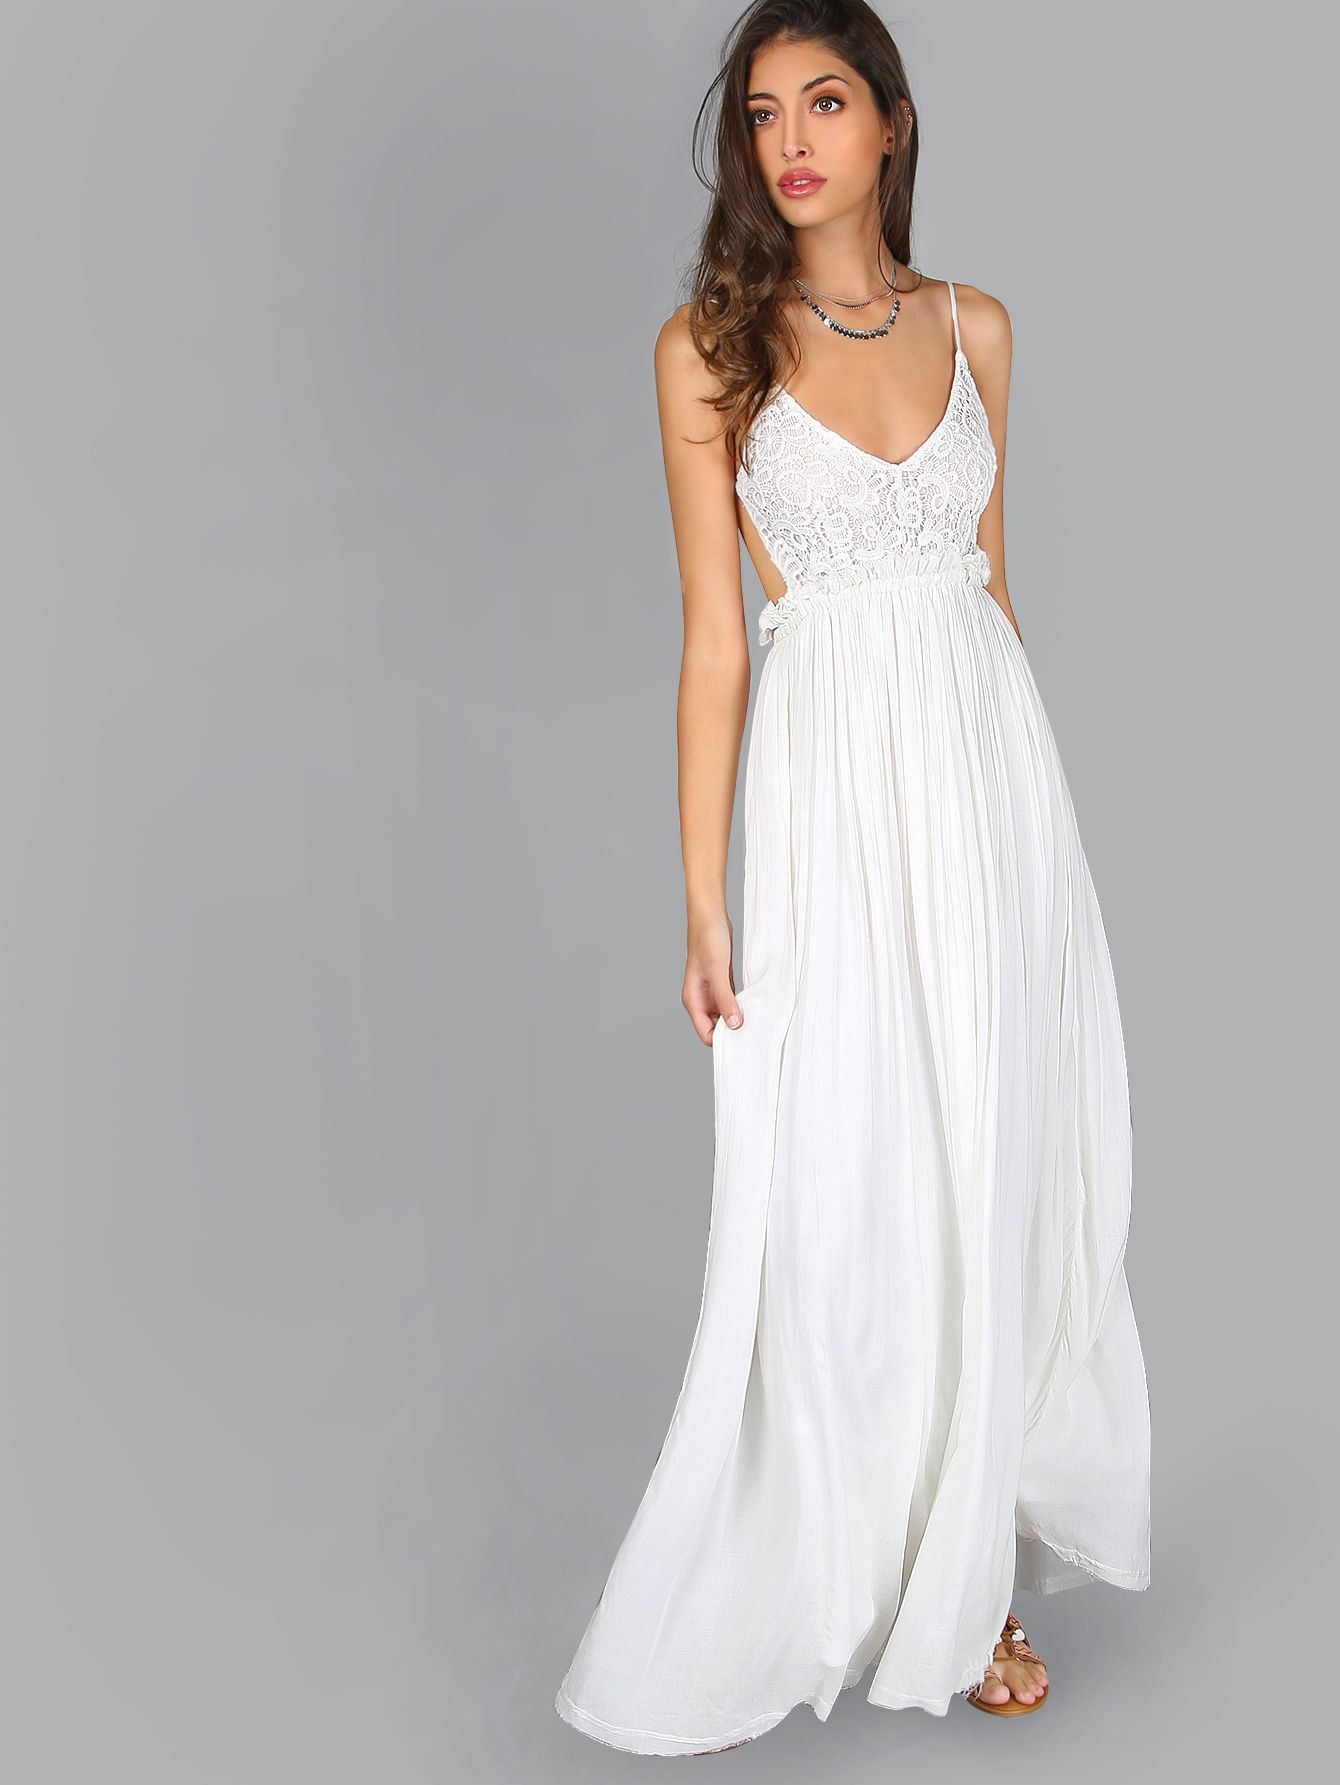 13 Einzigartig Abendkleid Lang Xs Bester Preis20 Luxus Abendkleid Lang Xs Spezialgebiet